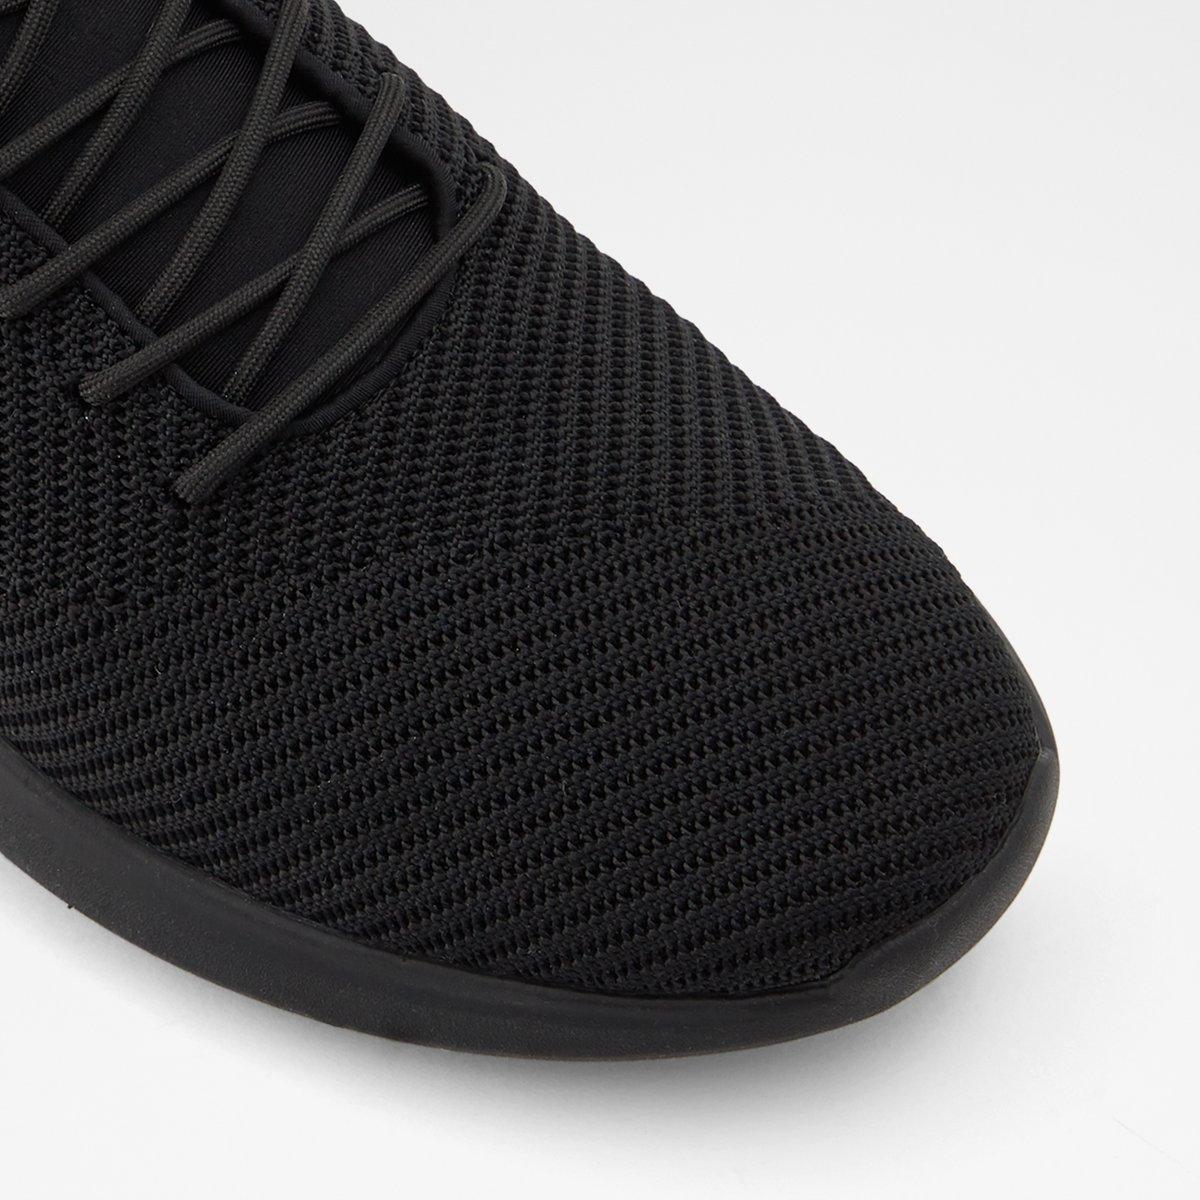 RPPL lace-up sneakers Black Men's